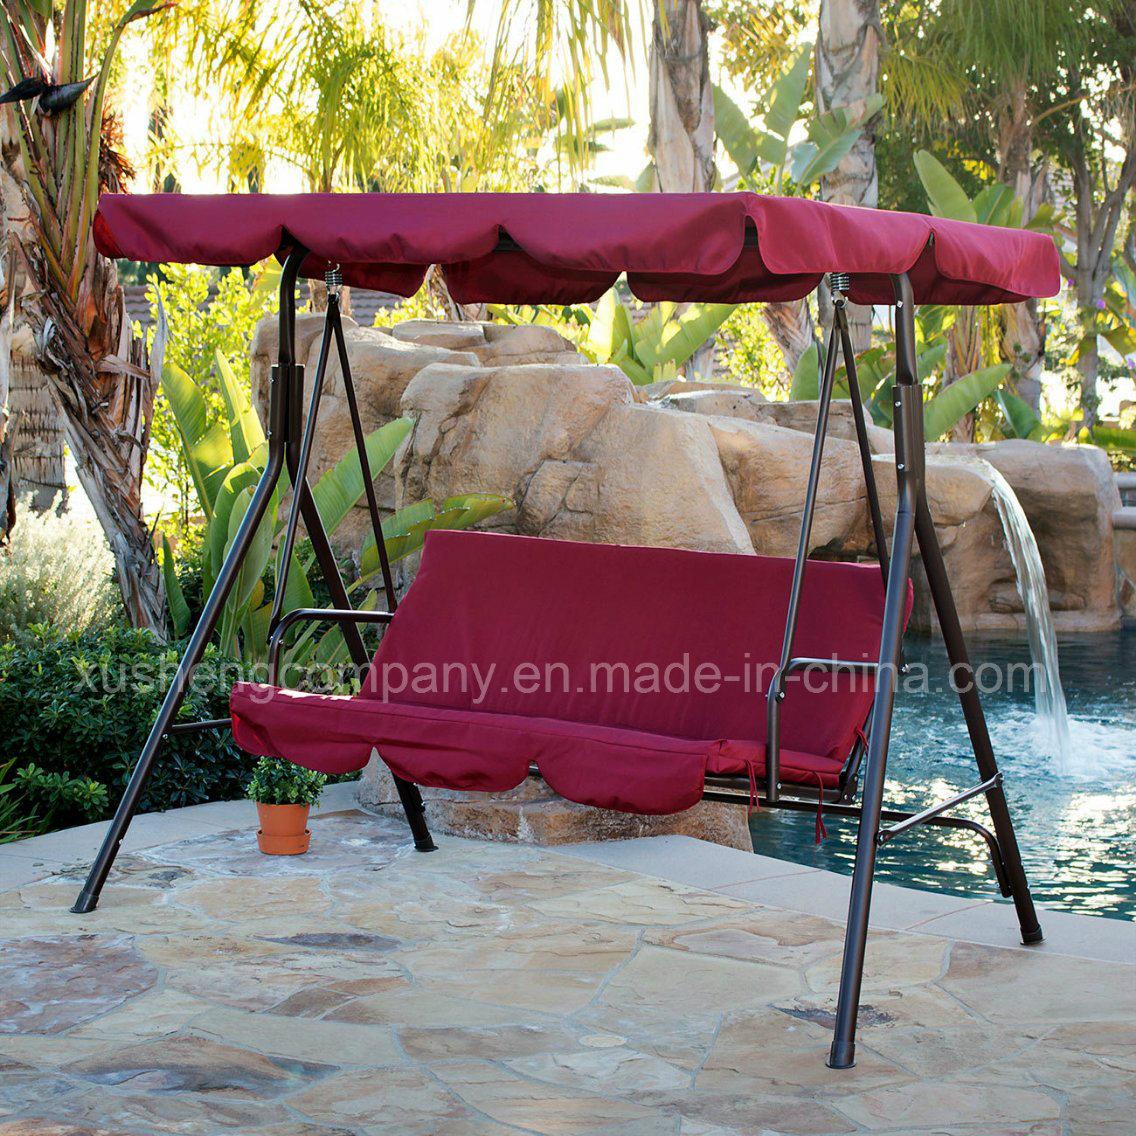 3 Seat Garden Swing Chair